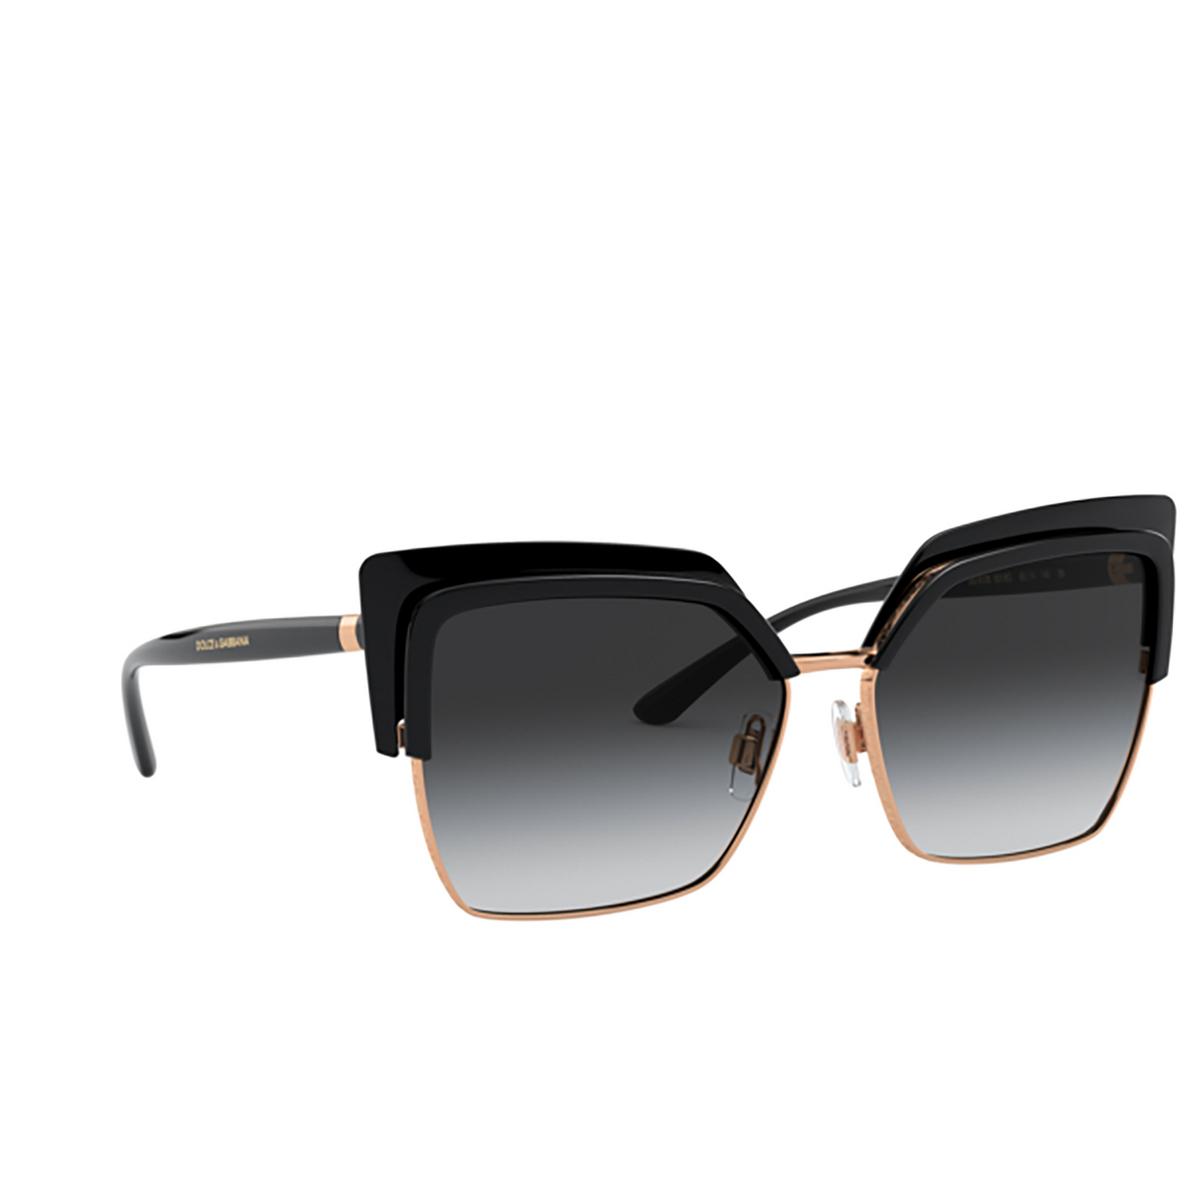 Dolce & Gabbana® Butterfly Sunglasses: DG6126 color Black 501/8G - 2/3.